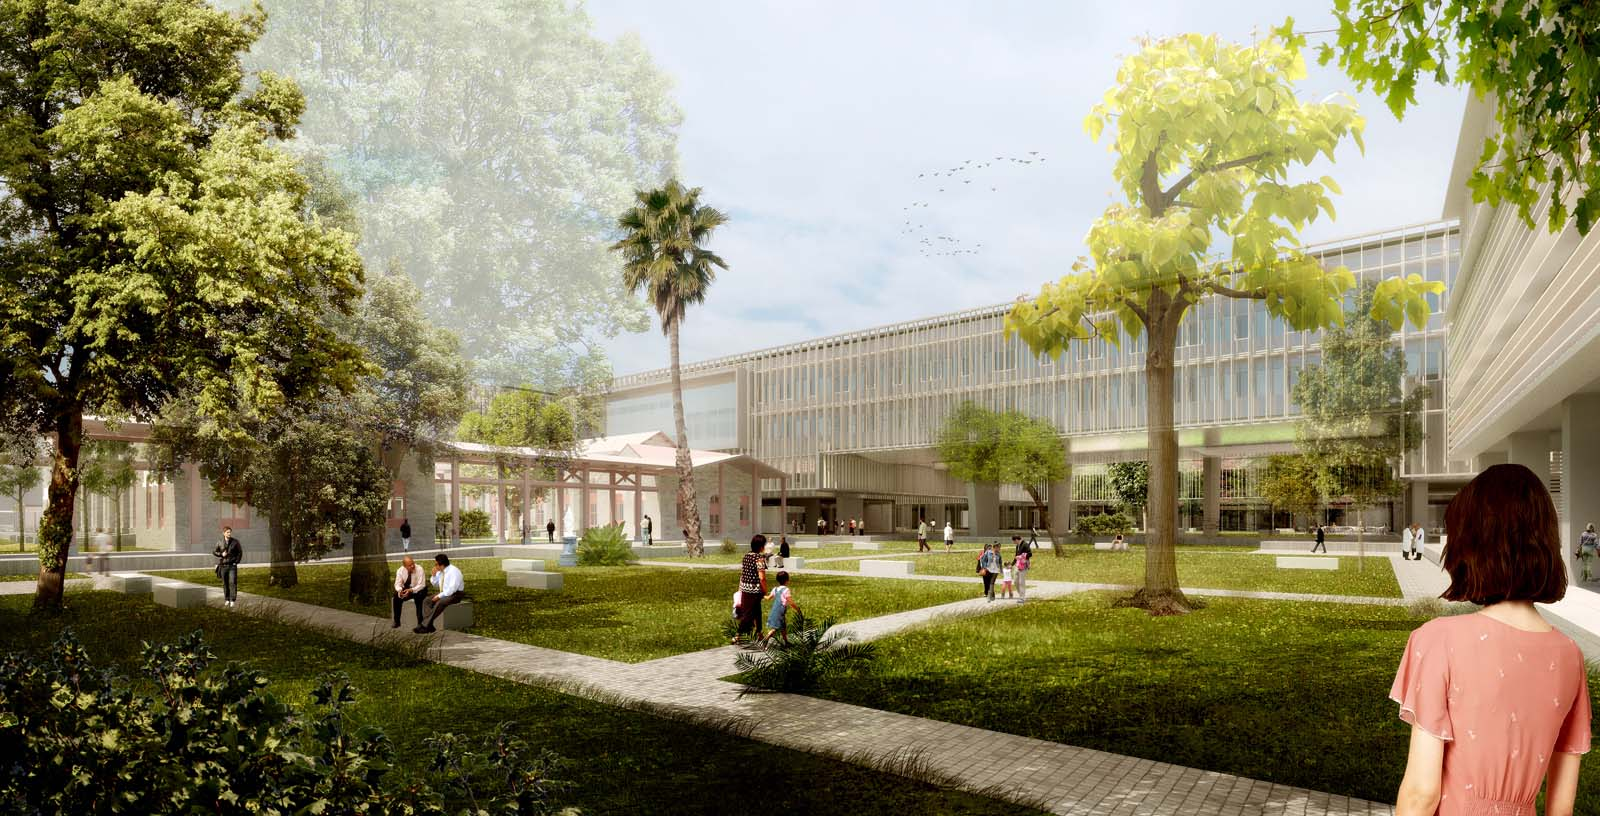 El_Salvador_hospital_02_Architecture_IDOM_computer_graphics_Poliedro